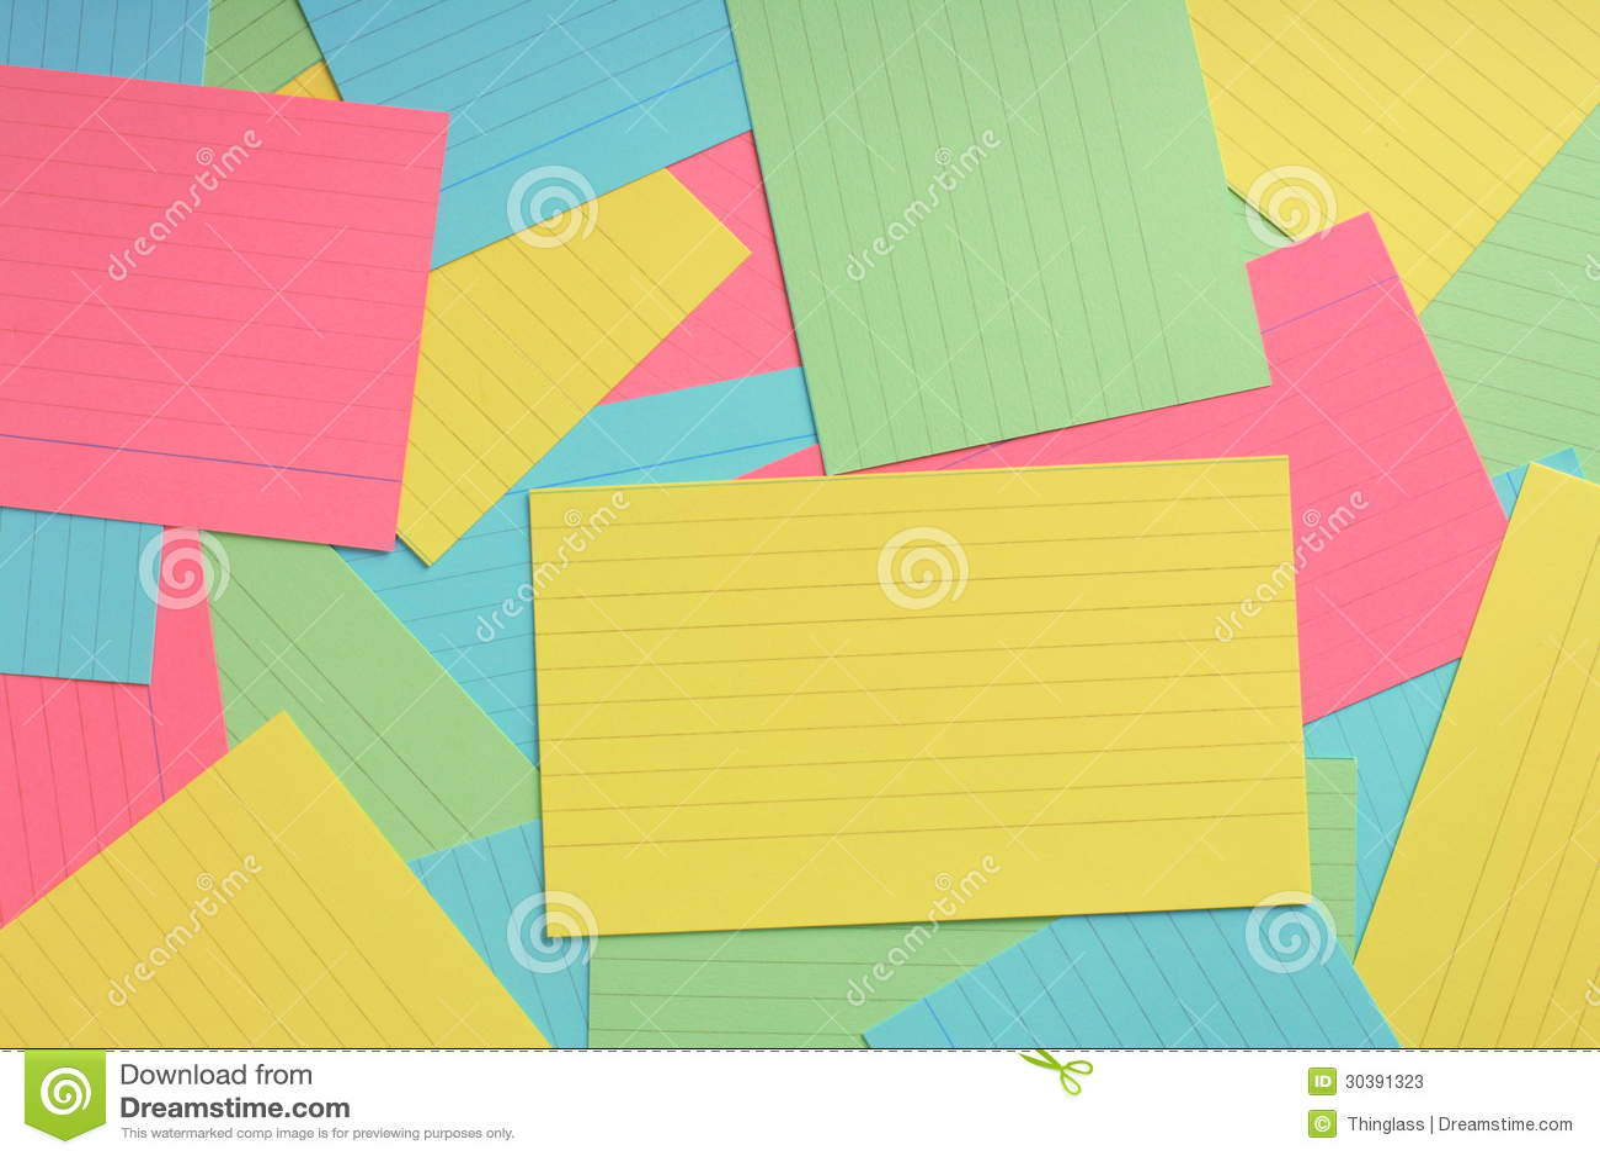 Fondo De La Tarjeta De índice Imagen de archivo - Imagen de amarillo ...